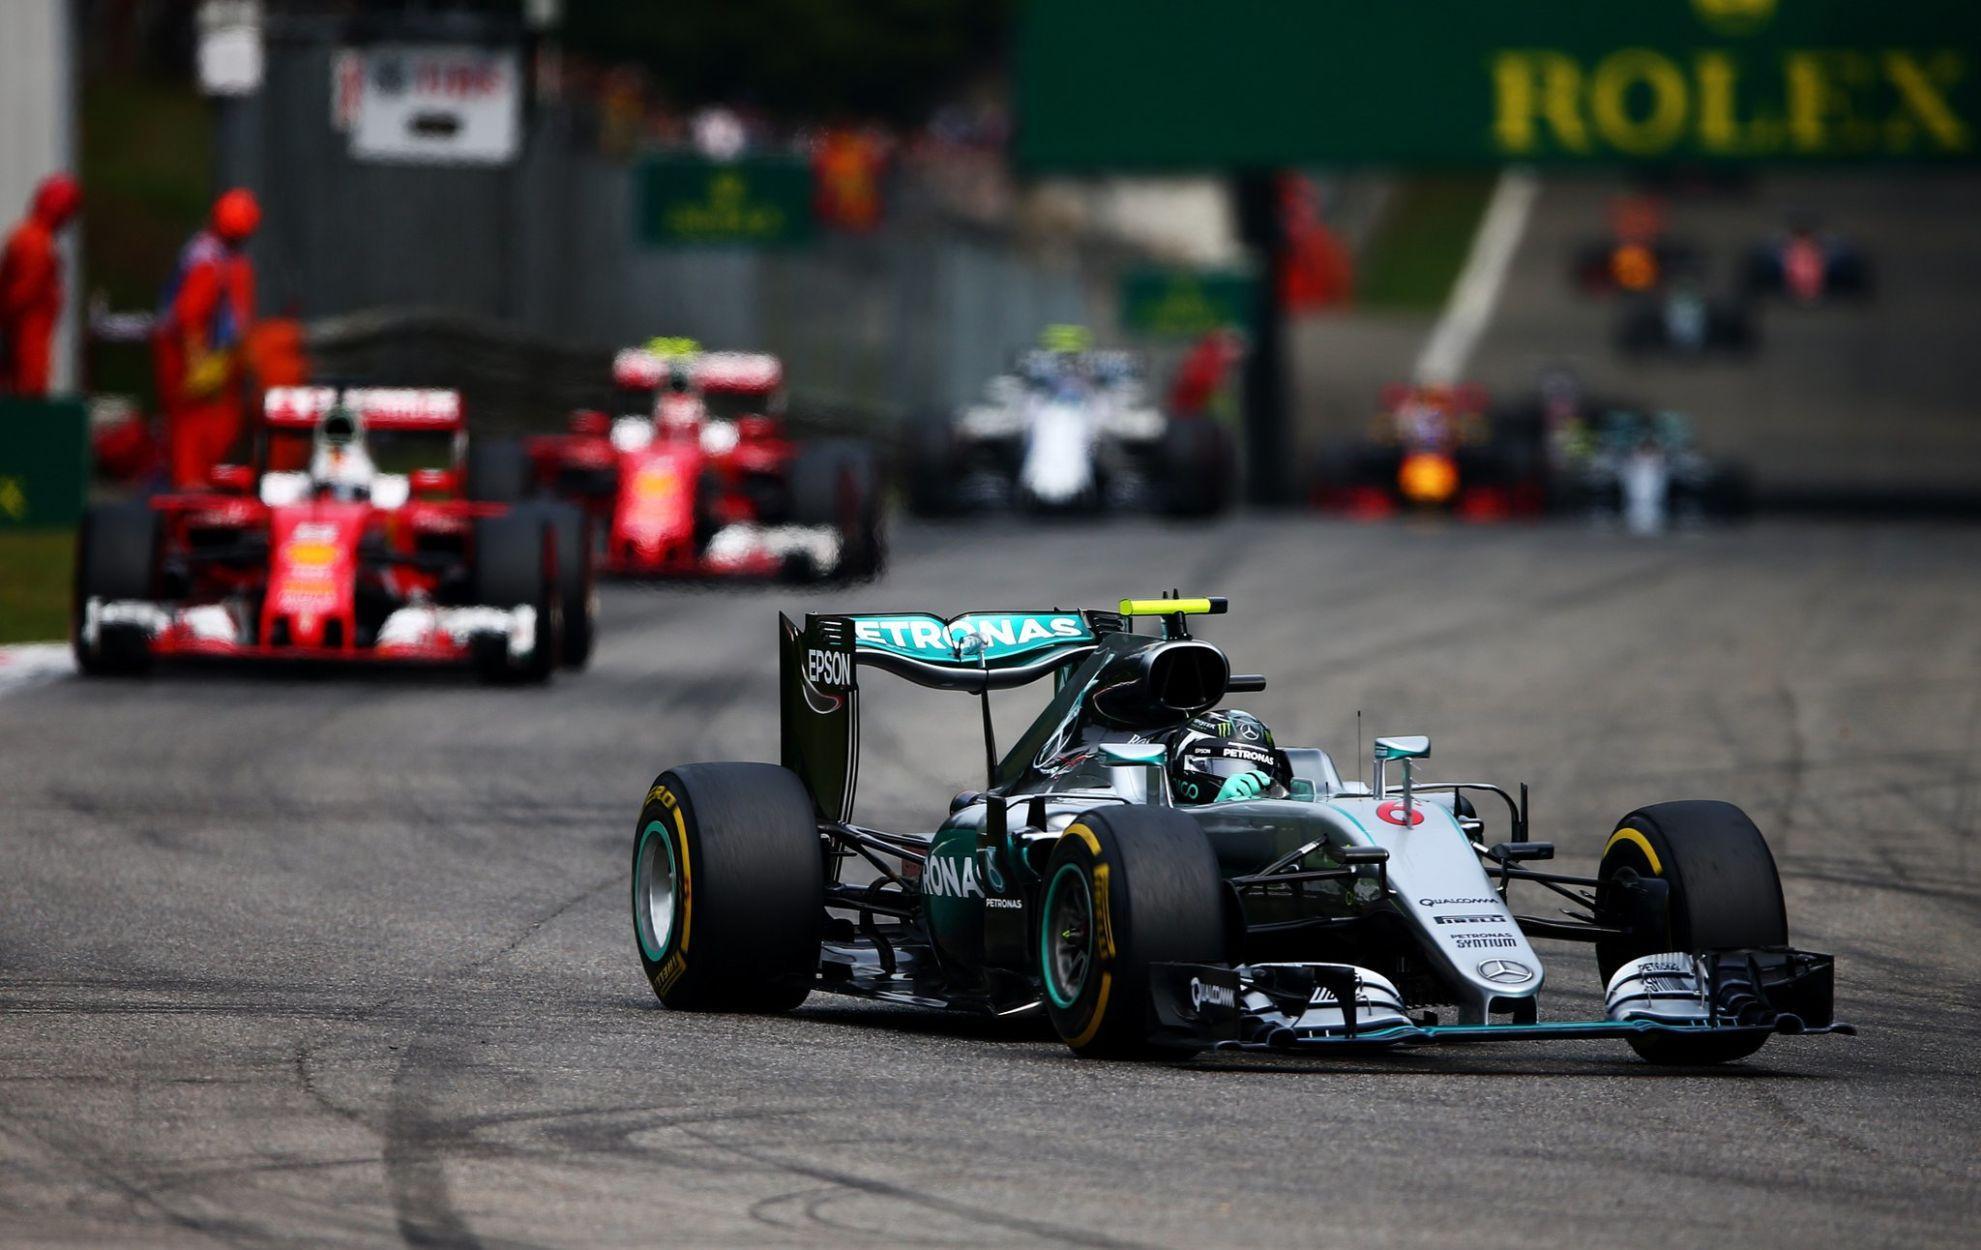 Rosberg_Mercedes_Victoire_Monza_2016_F1